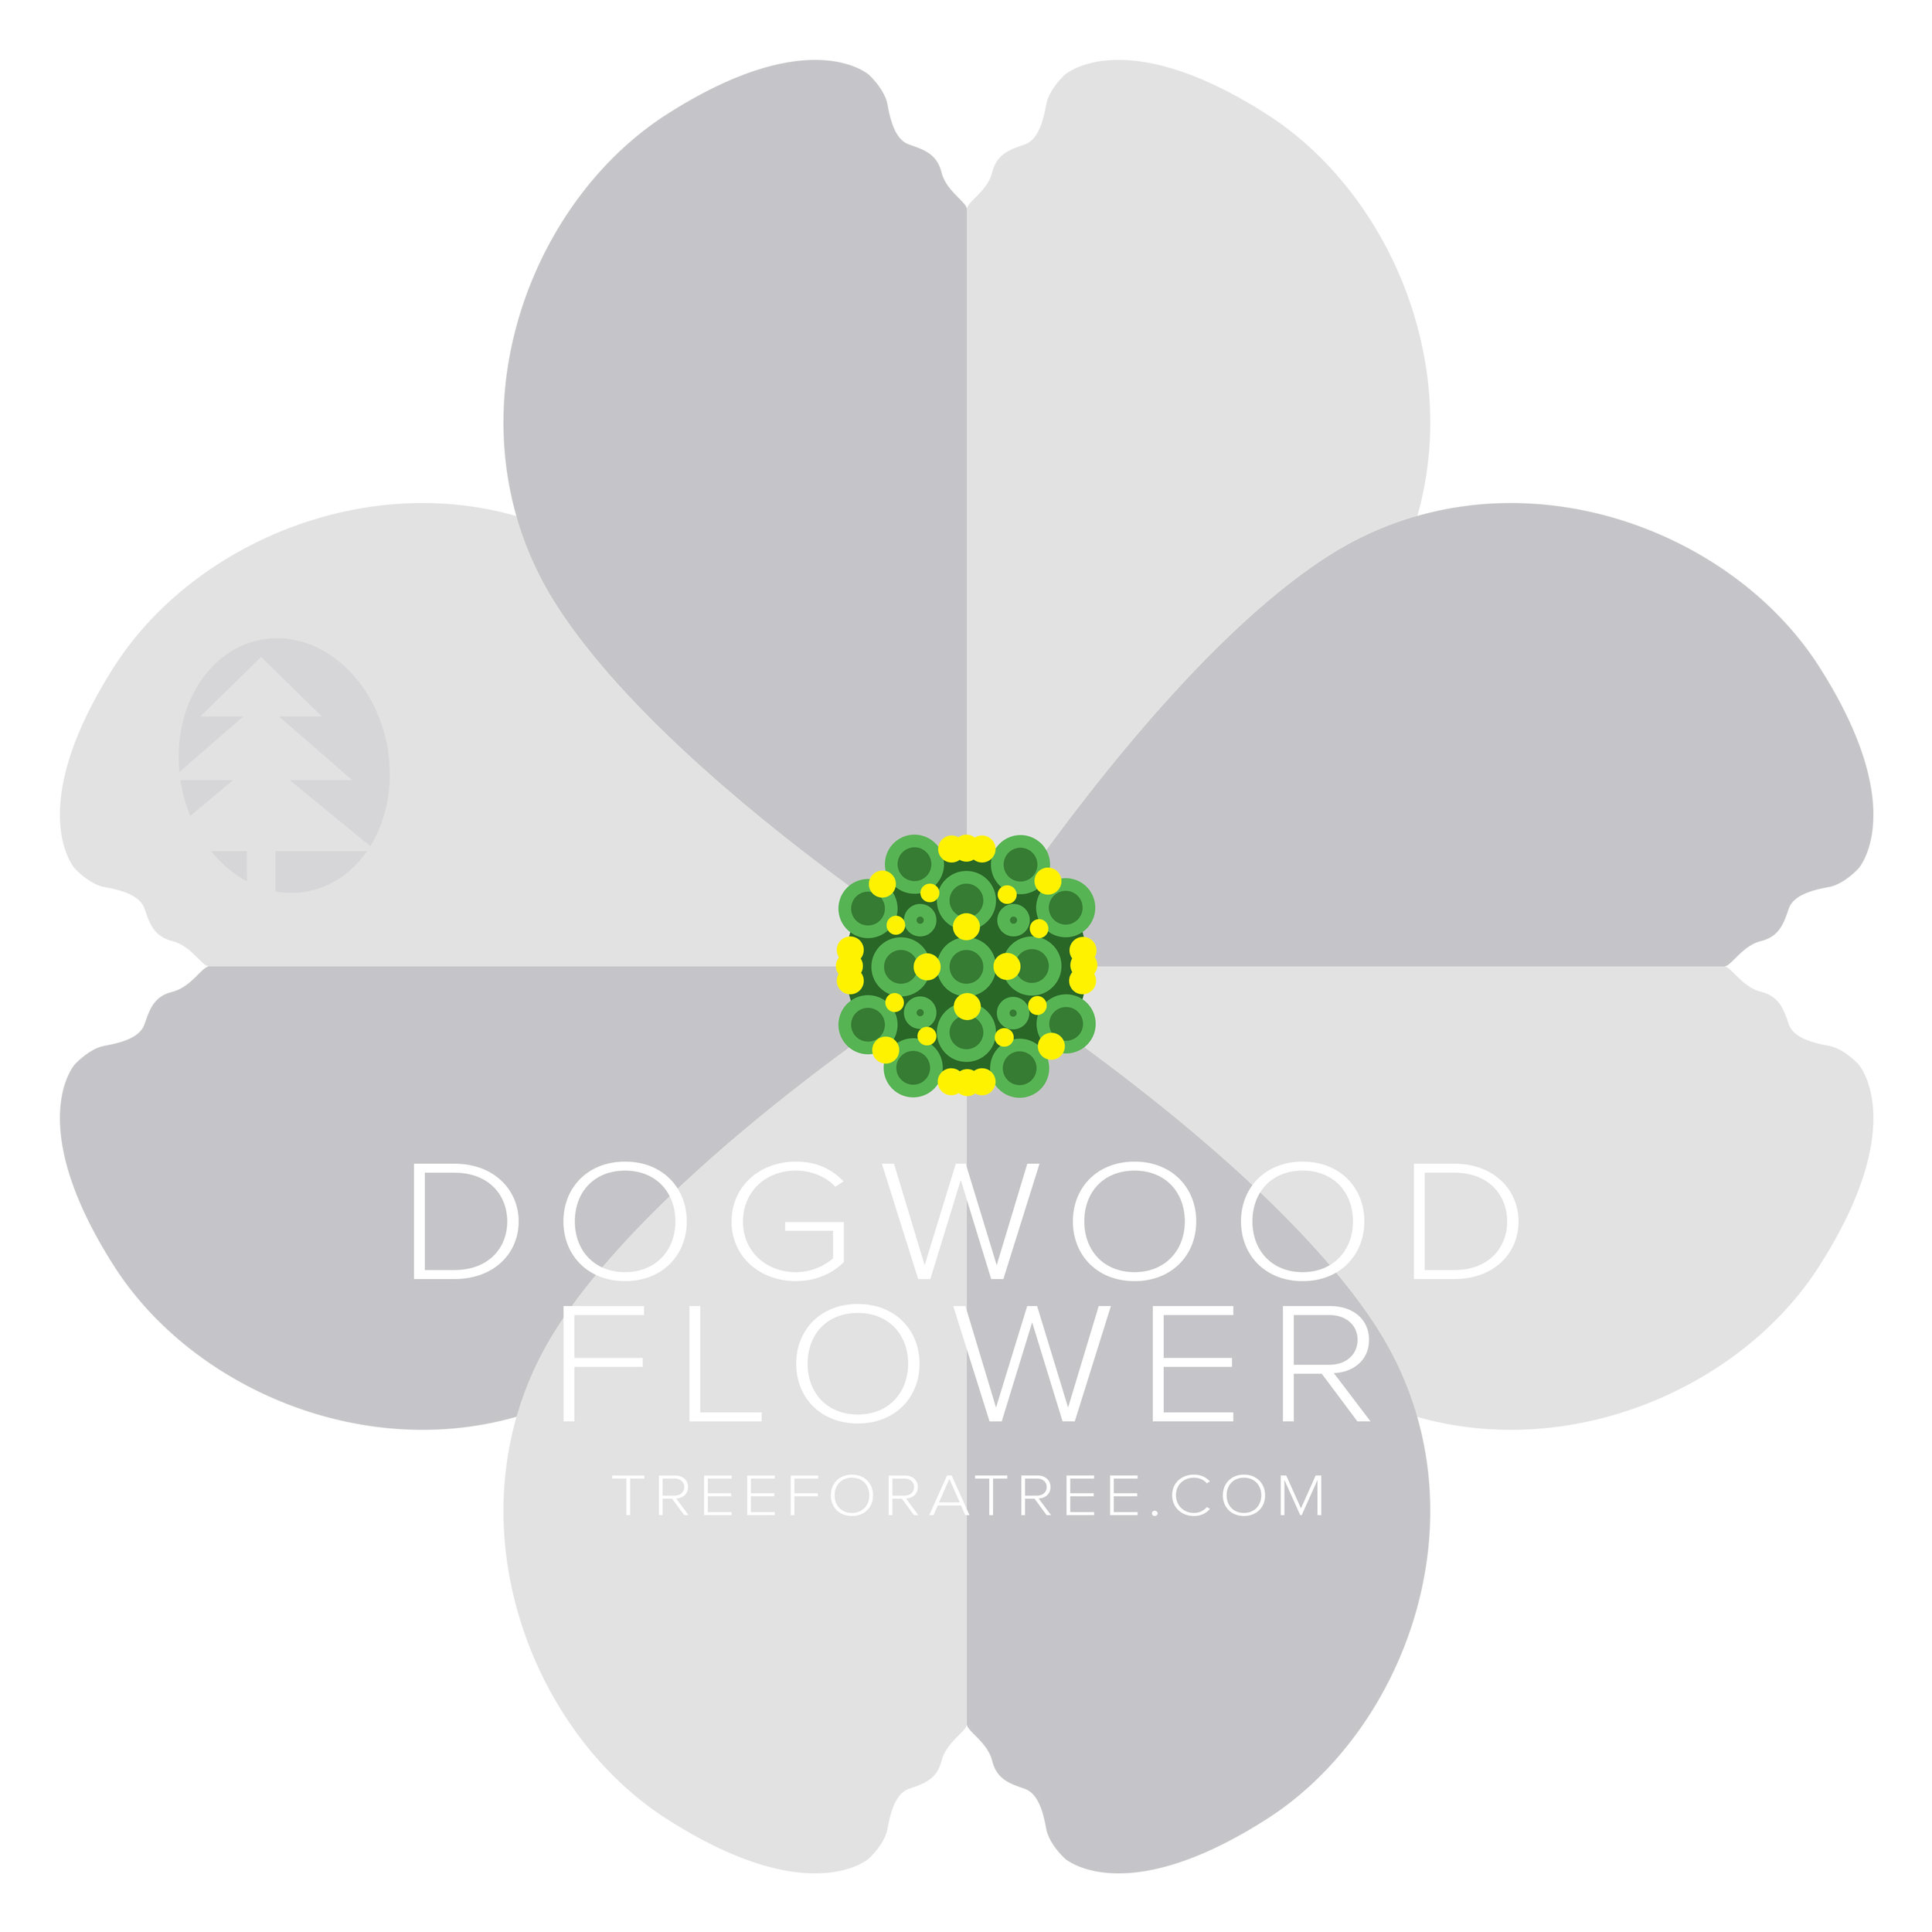 Dogwood - Latin Name: Cornus floridaGrowth Rate: SlowMature Height: ≈15 ftMature Spread: ≈20 ftState Champ: Licking Co. (33' high x 42' spread)